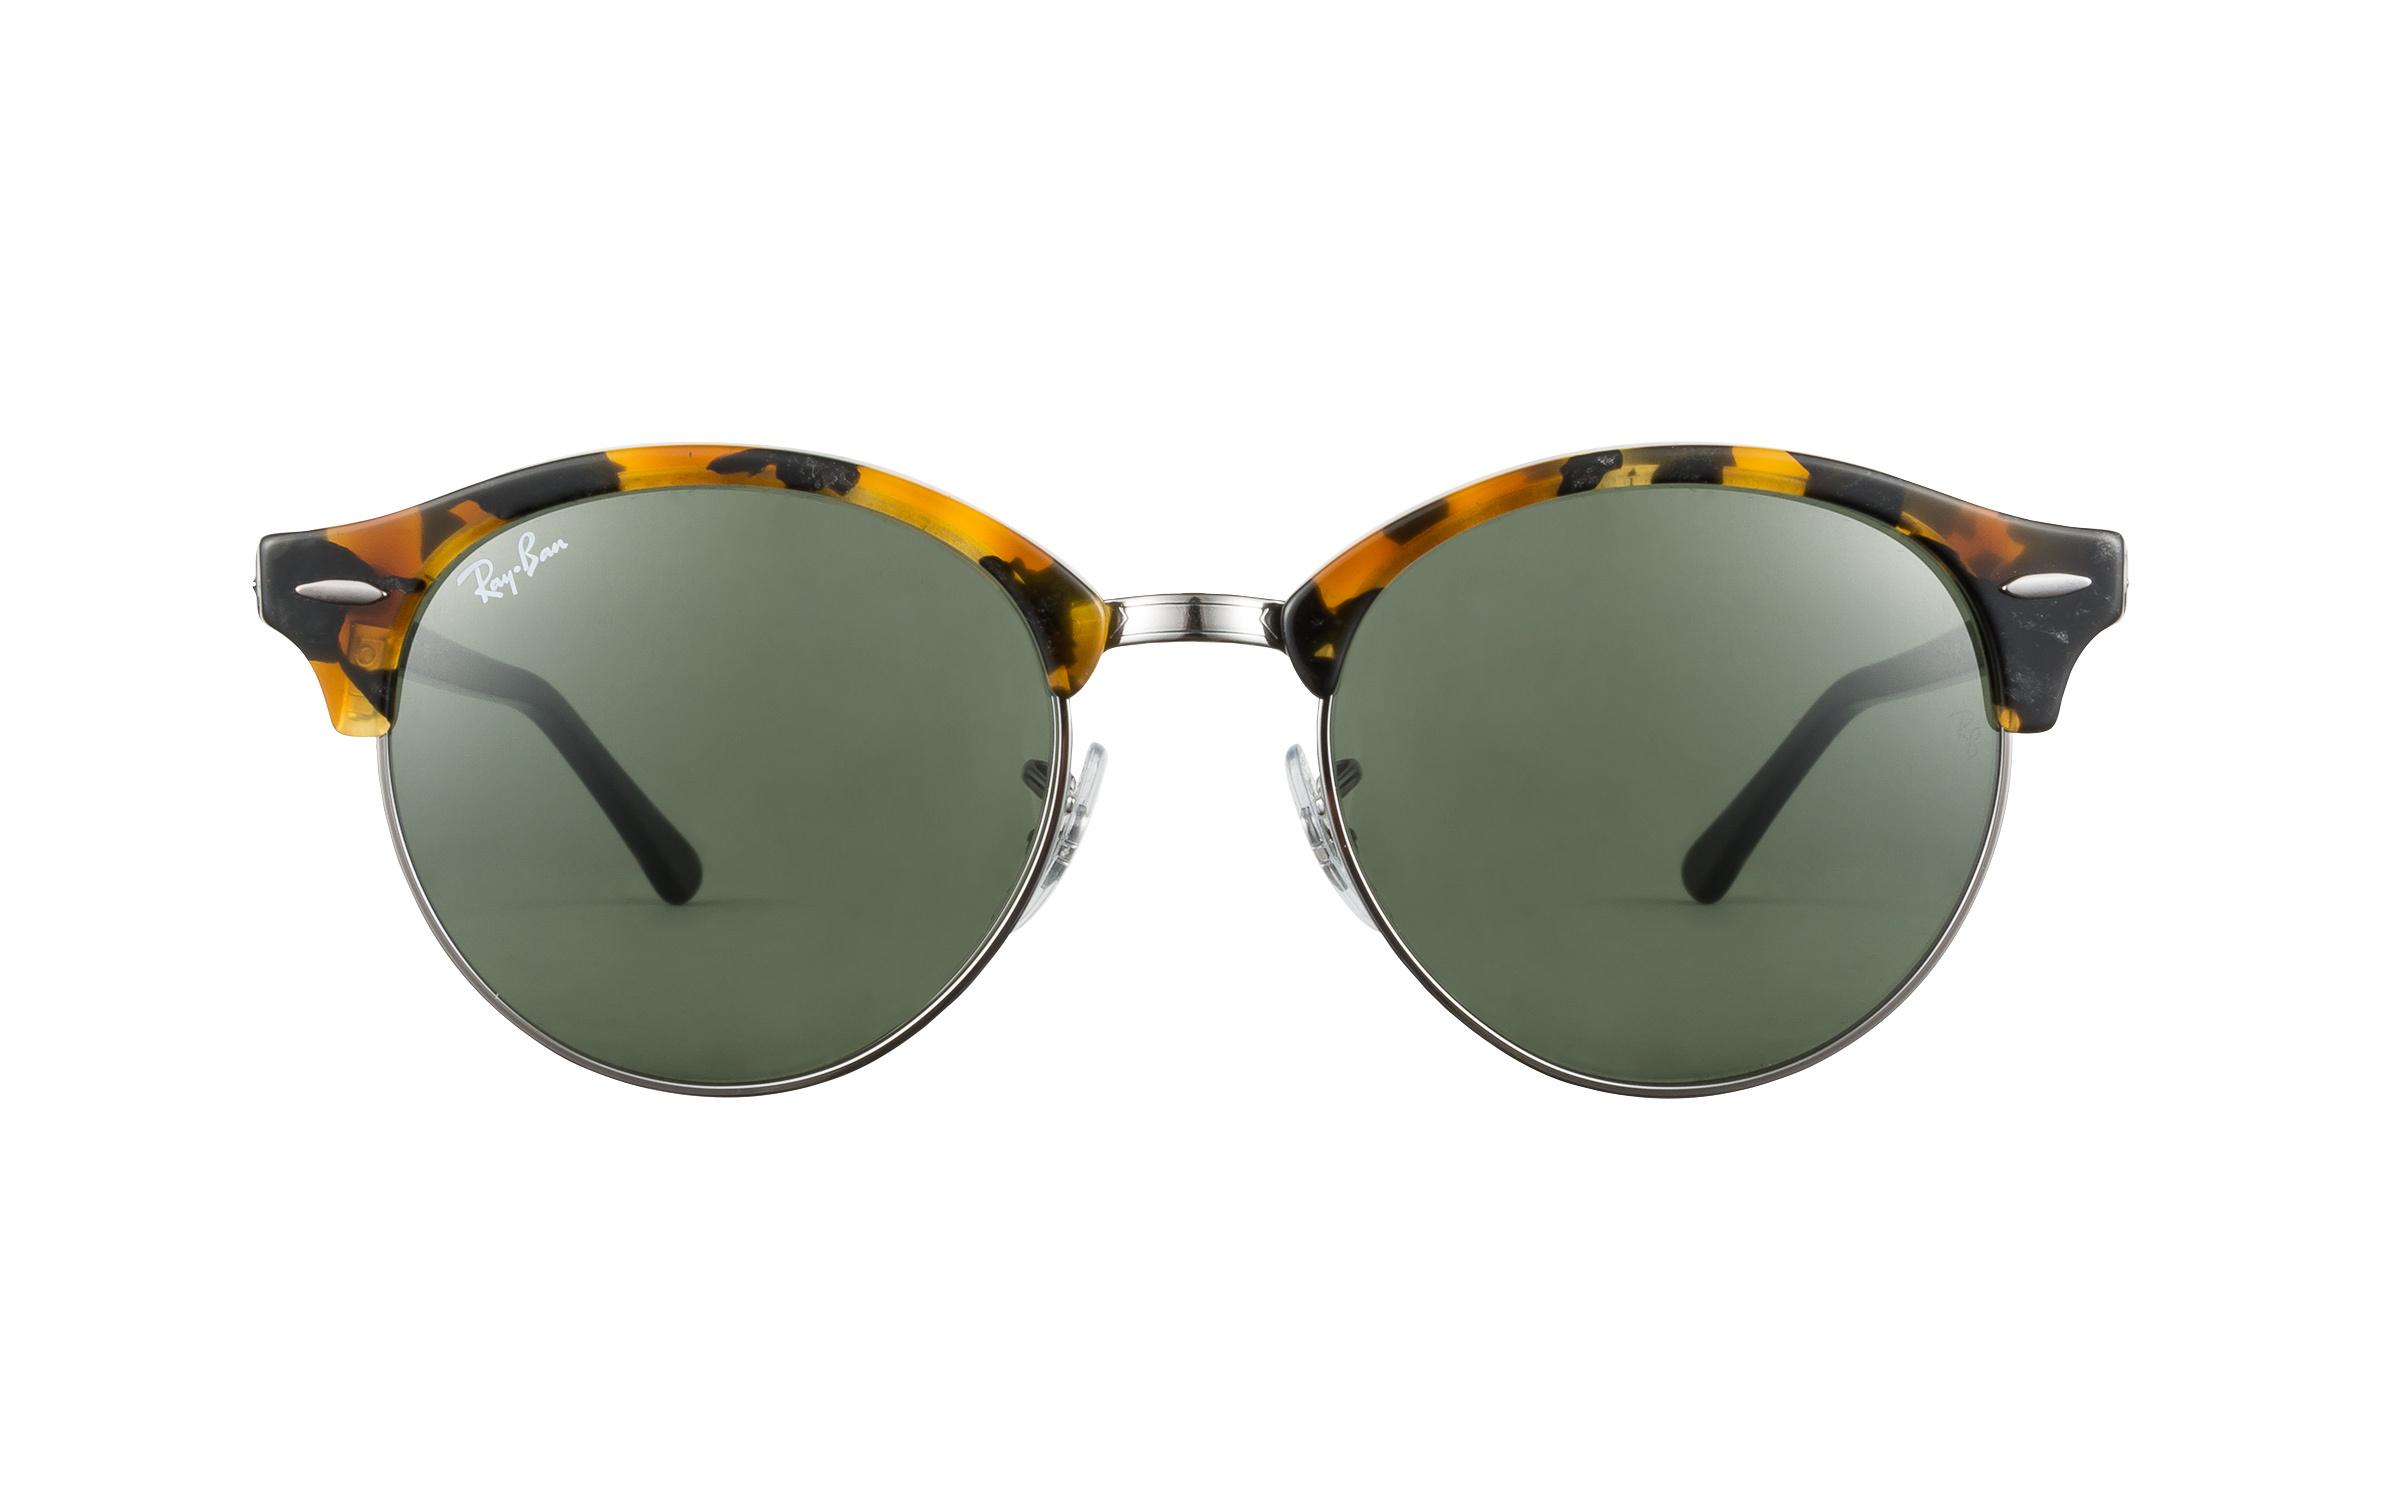 Ray-Ban Sunglasses Round Tortoise Online Coastal